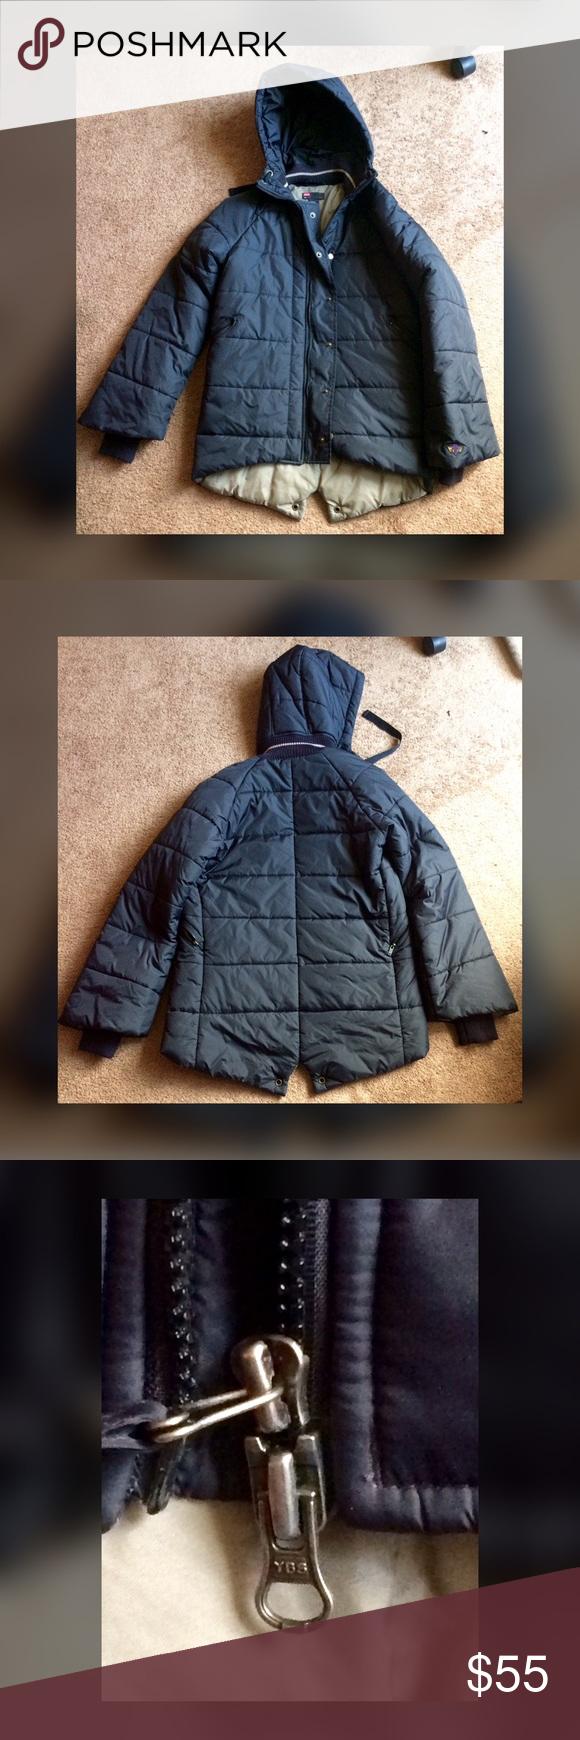 Women S Diesel Brand Puffer Coat Size Medium Puffer Coat Diesel Brand Diesel Jacket [ 1740 x 580 Pixel ]